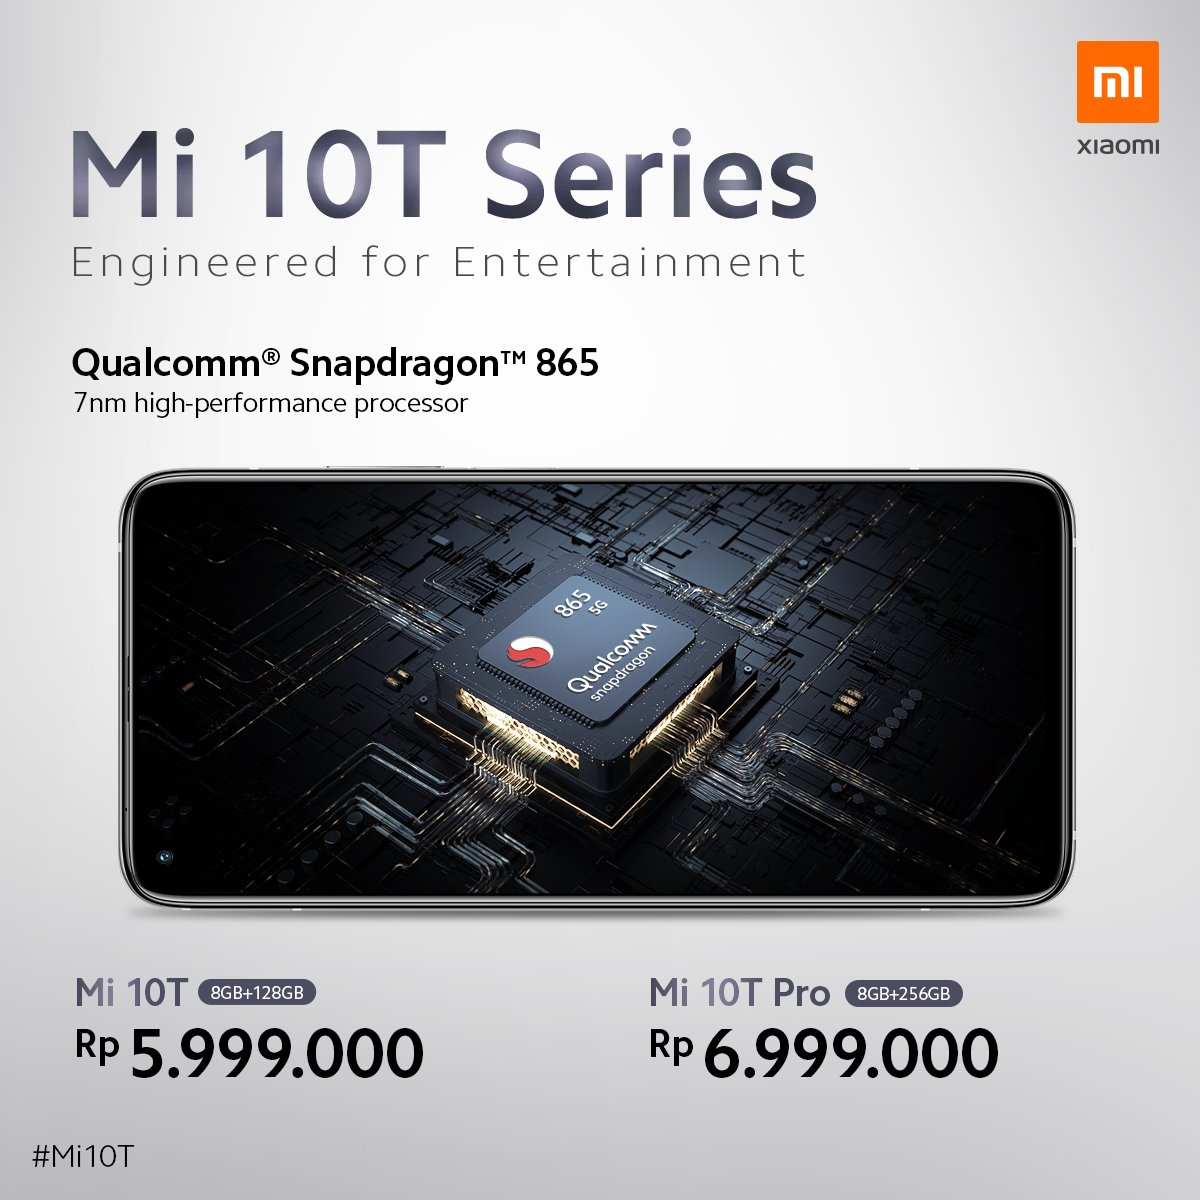 Harga Xiaomi Mi 10T Series